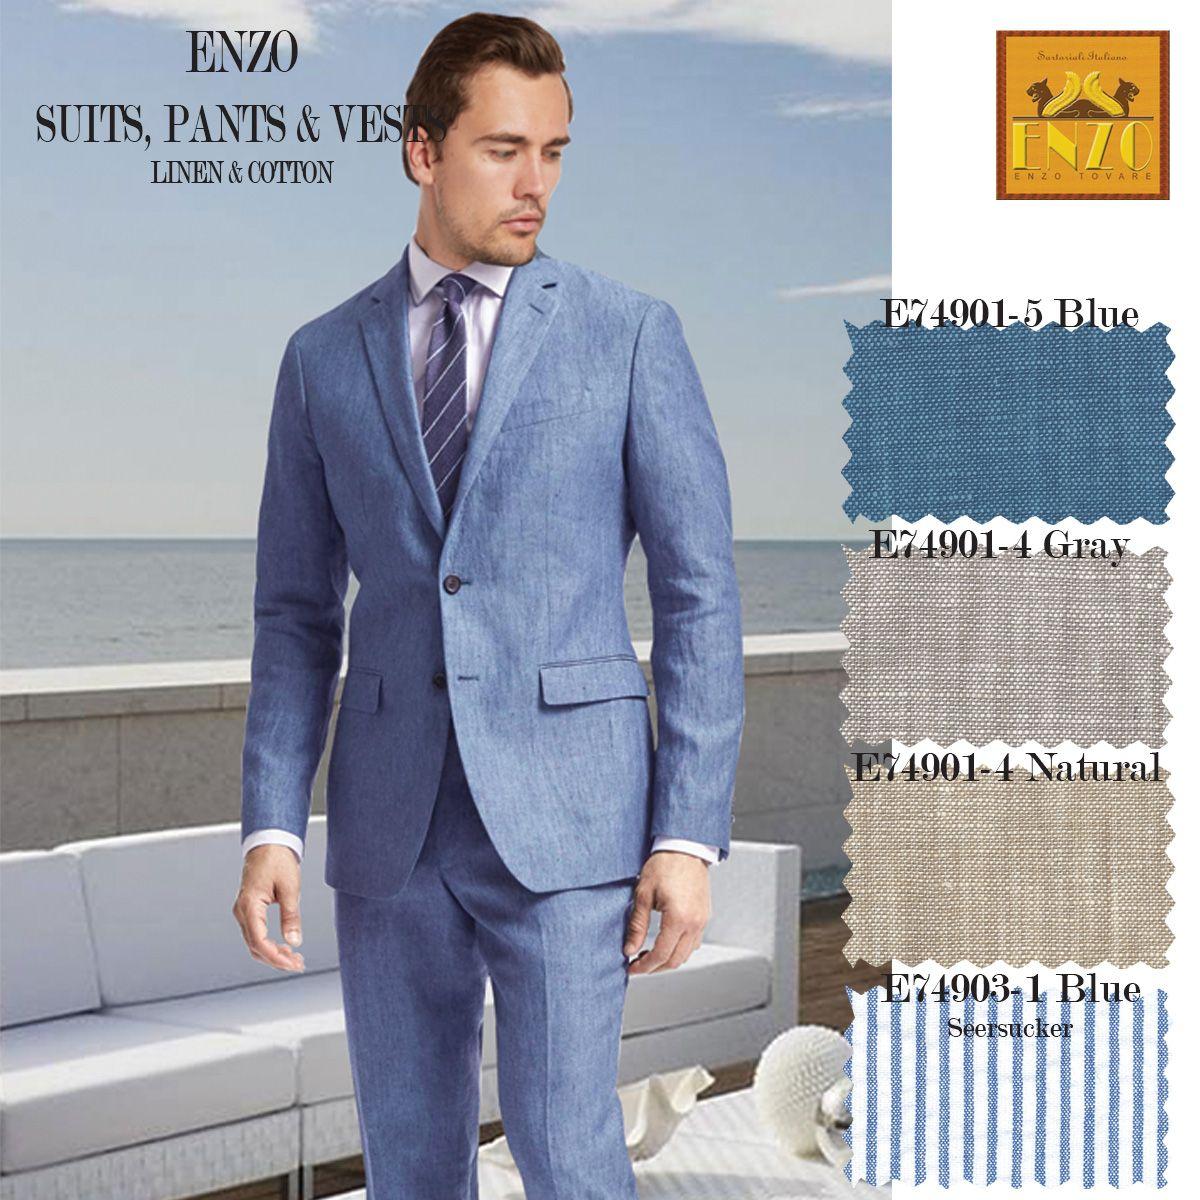 Italian Wool Suits For Men To Keep You Looking Sharp Moda Italy Fashion Suits Italian Mens Fashion Italian Men